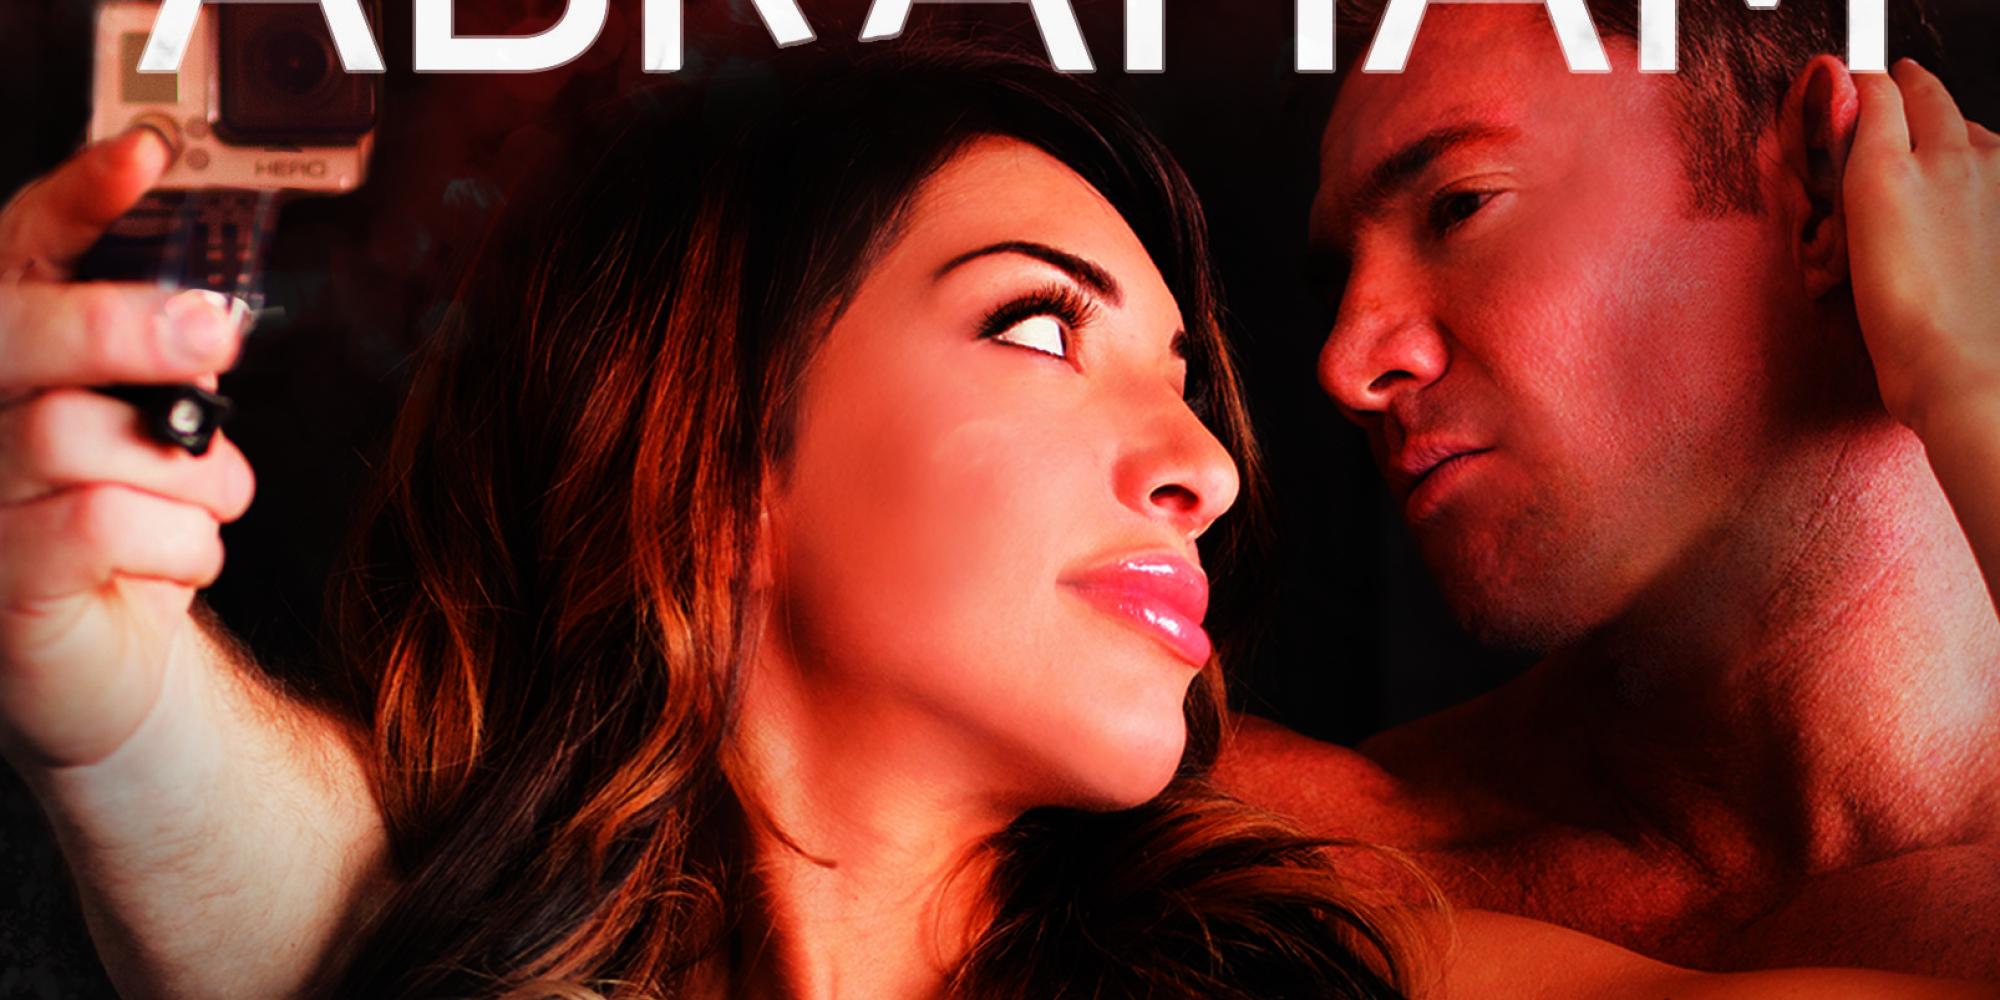 Abraham Porn Video farrah abraham releasing erotic trilogy about her porn video